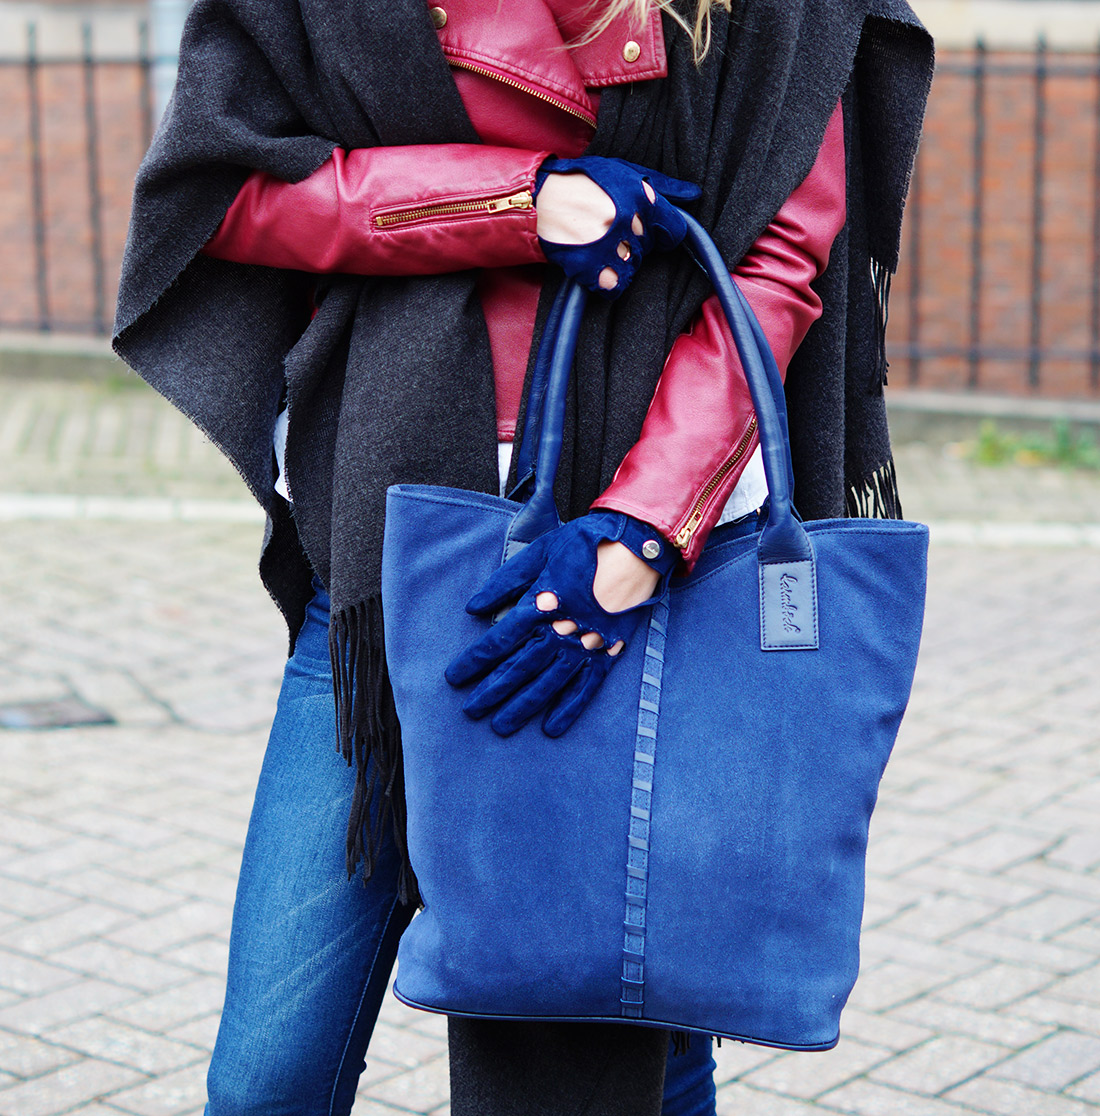 Bag-at-You---Fashion-blog---Denim-leather-jacket---Laimbock-shopper-and-gloves